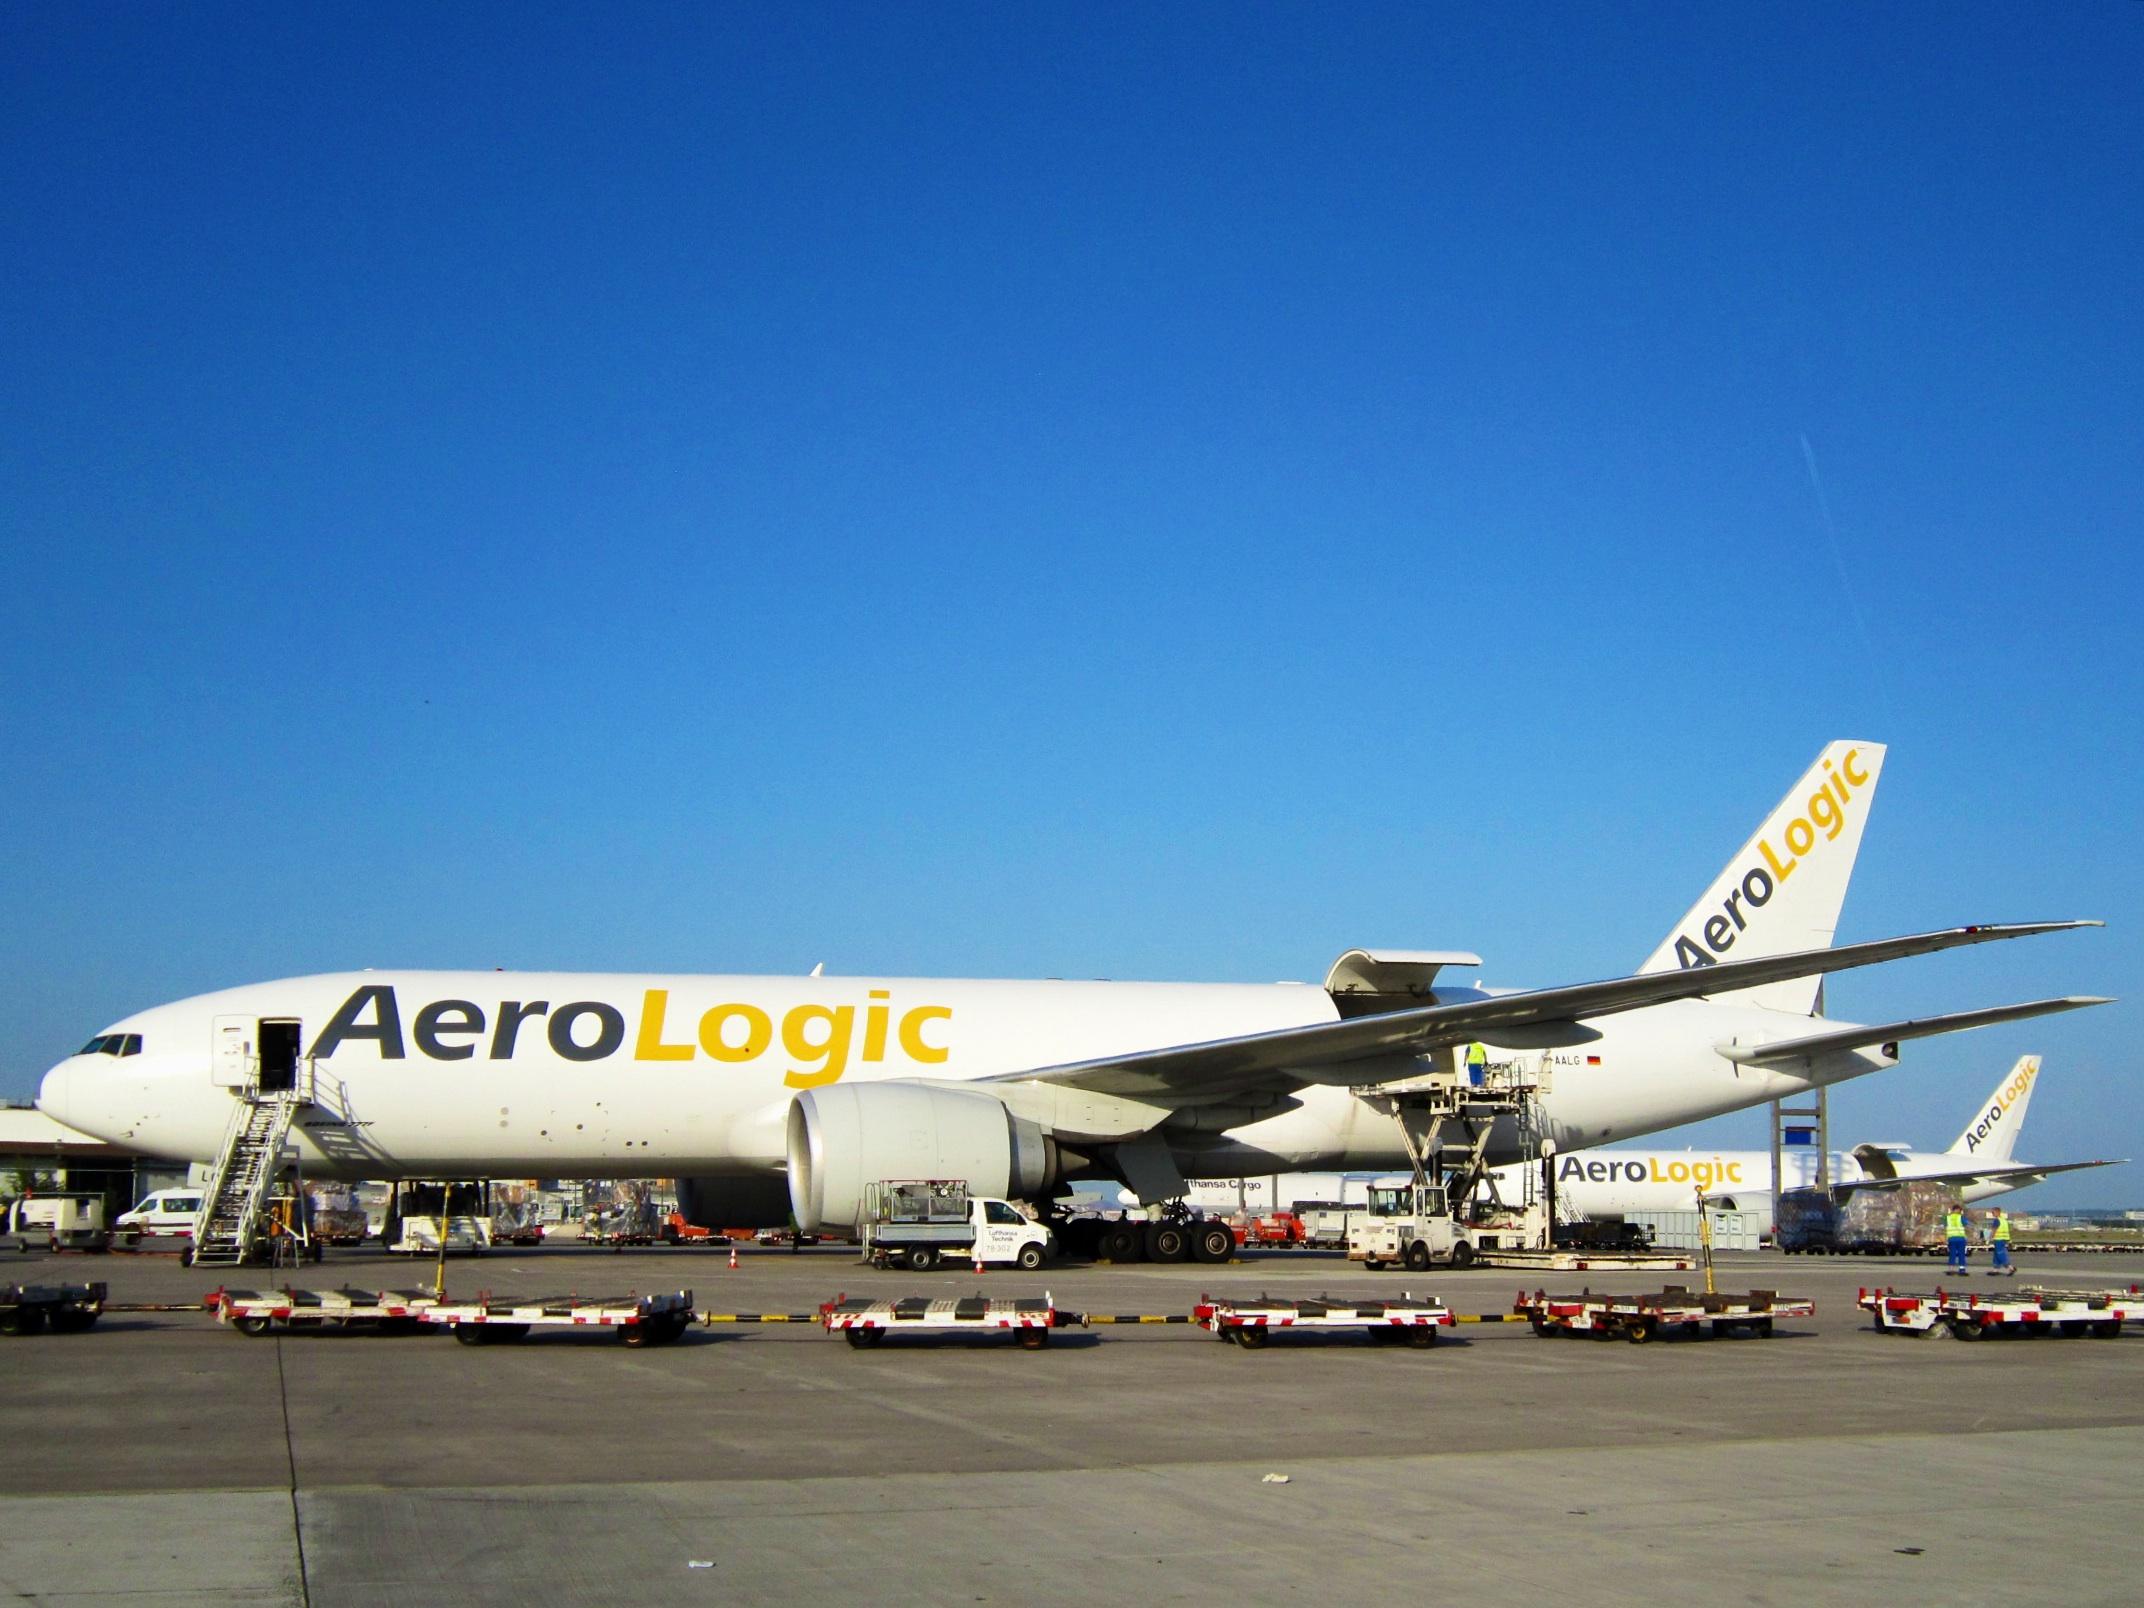 File:AeroLogic. Boeing 777-FZN. D-AALG (14203611787).jpg - Wikimedia Commons